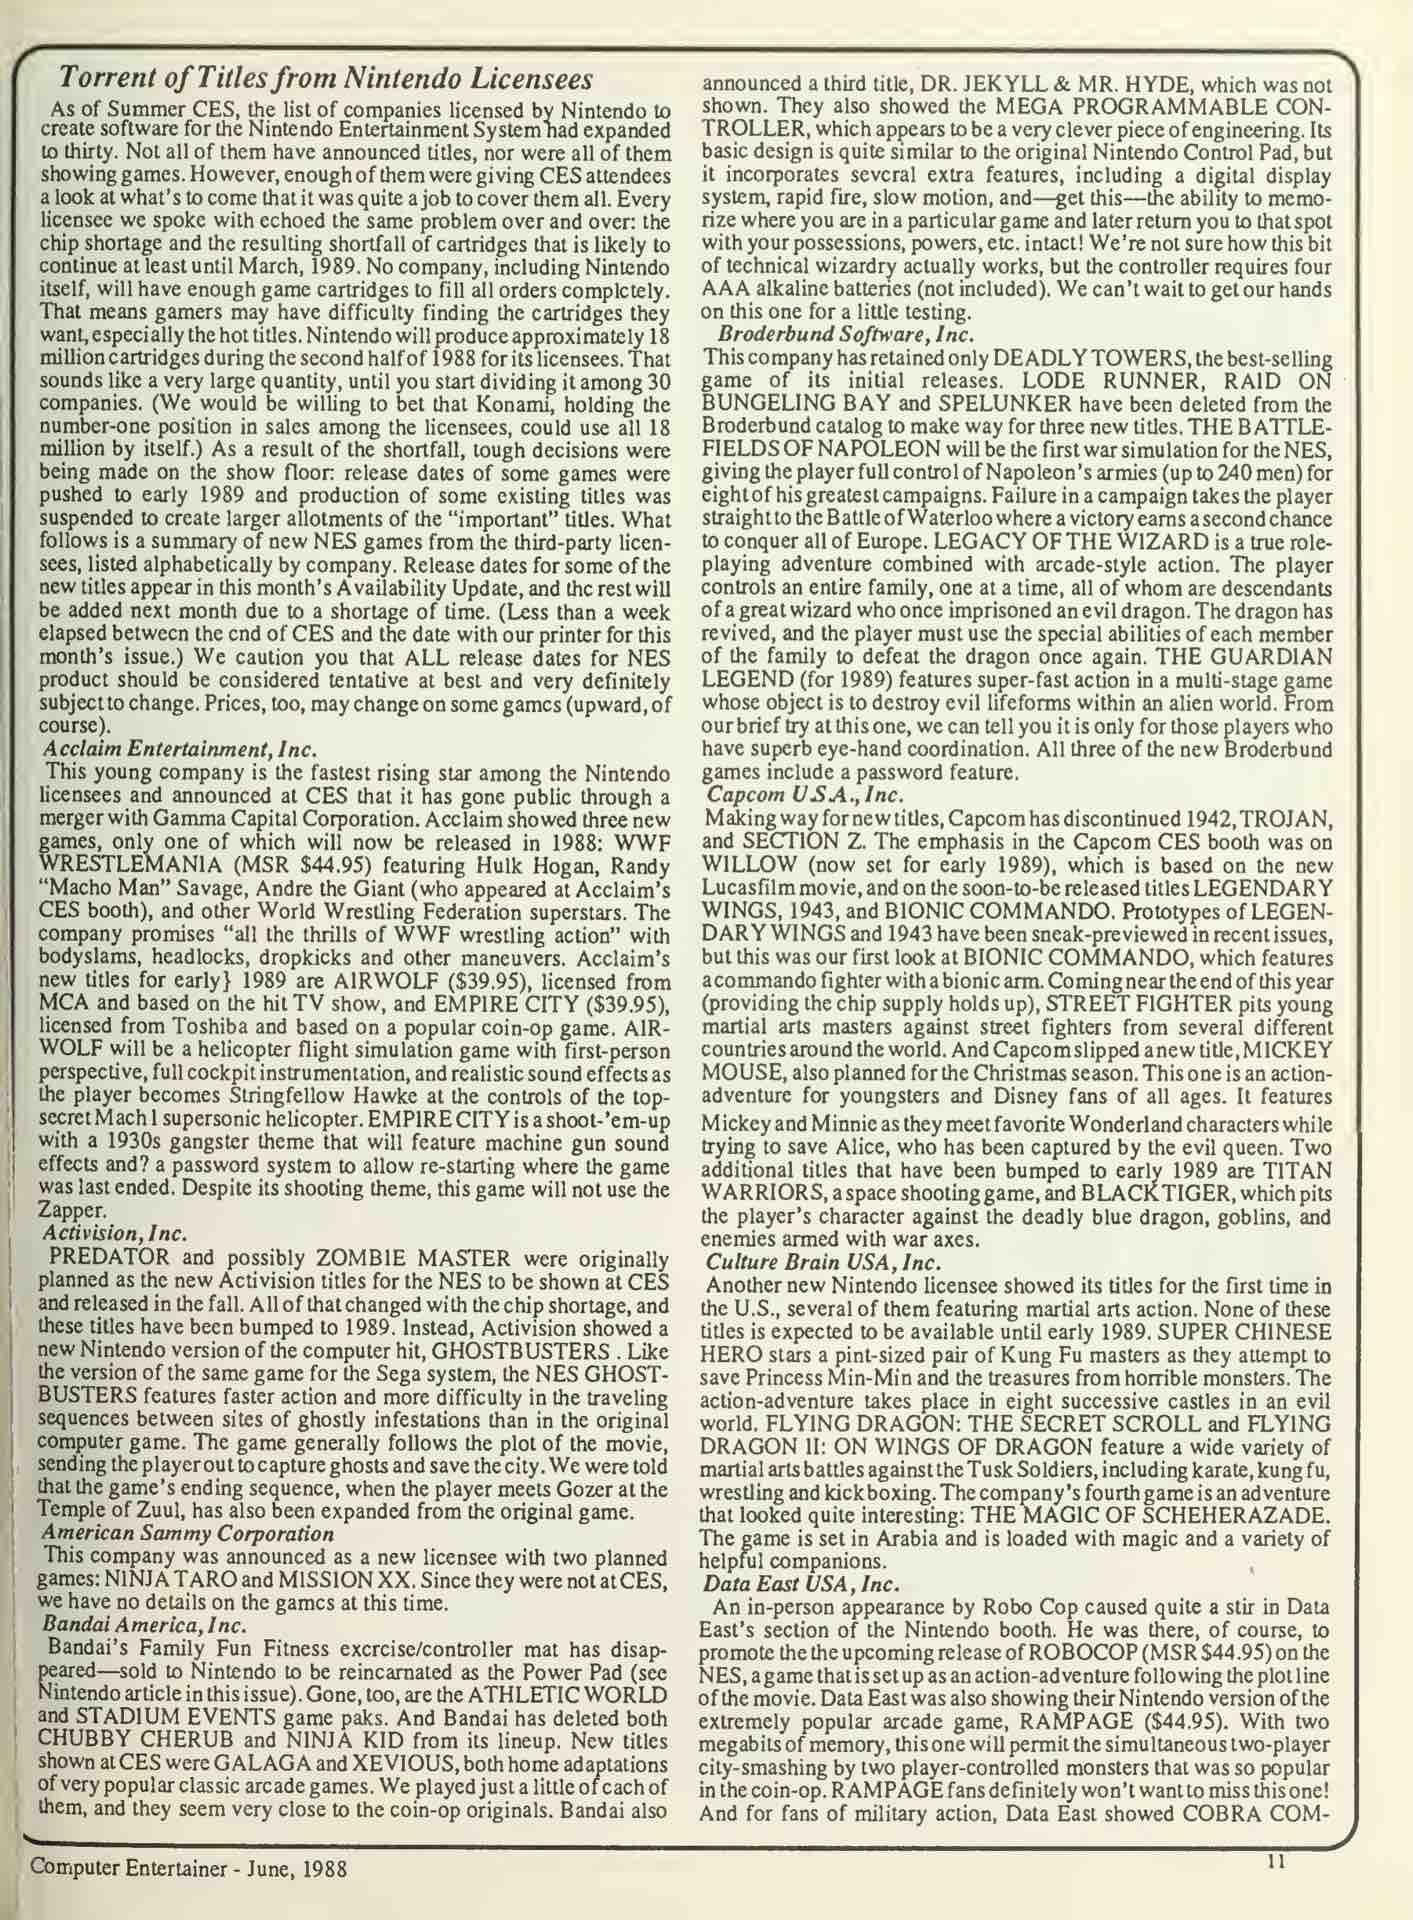 Computer Entertainer - June 1988 - pg 11